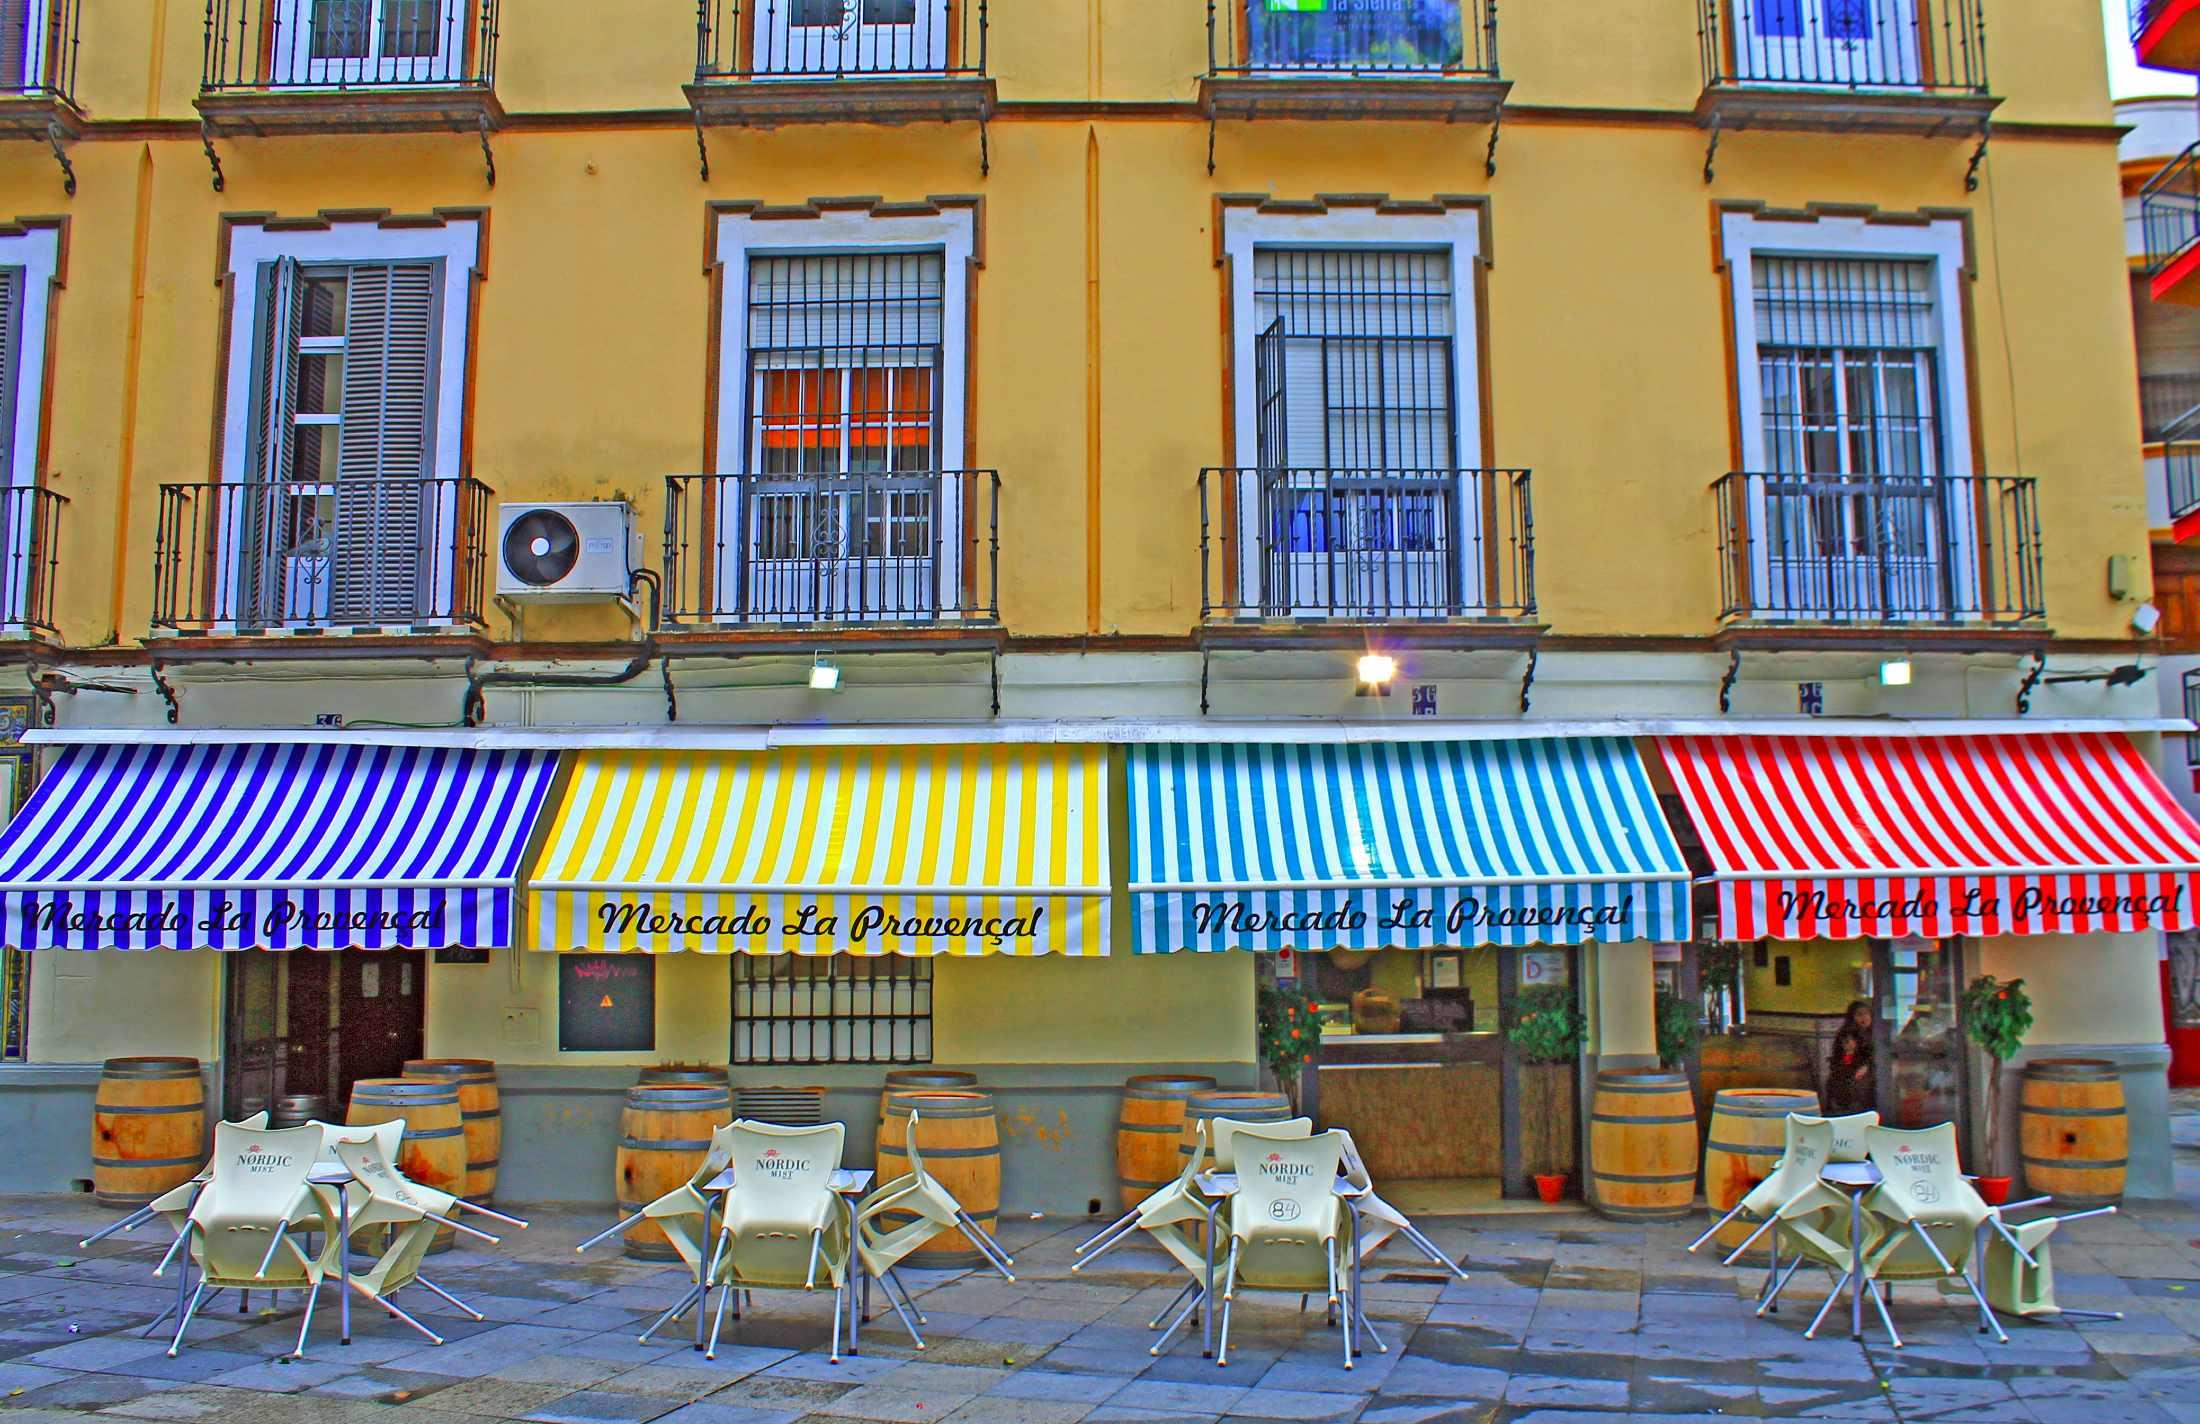 Seville - Focal Journey